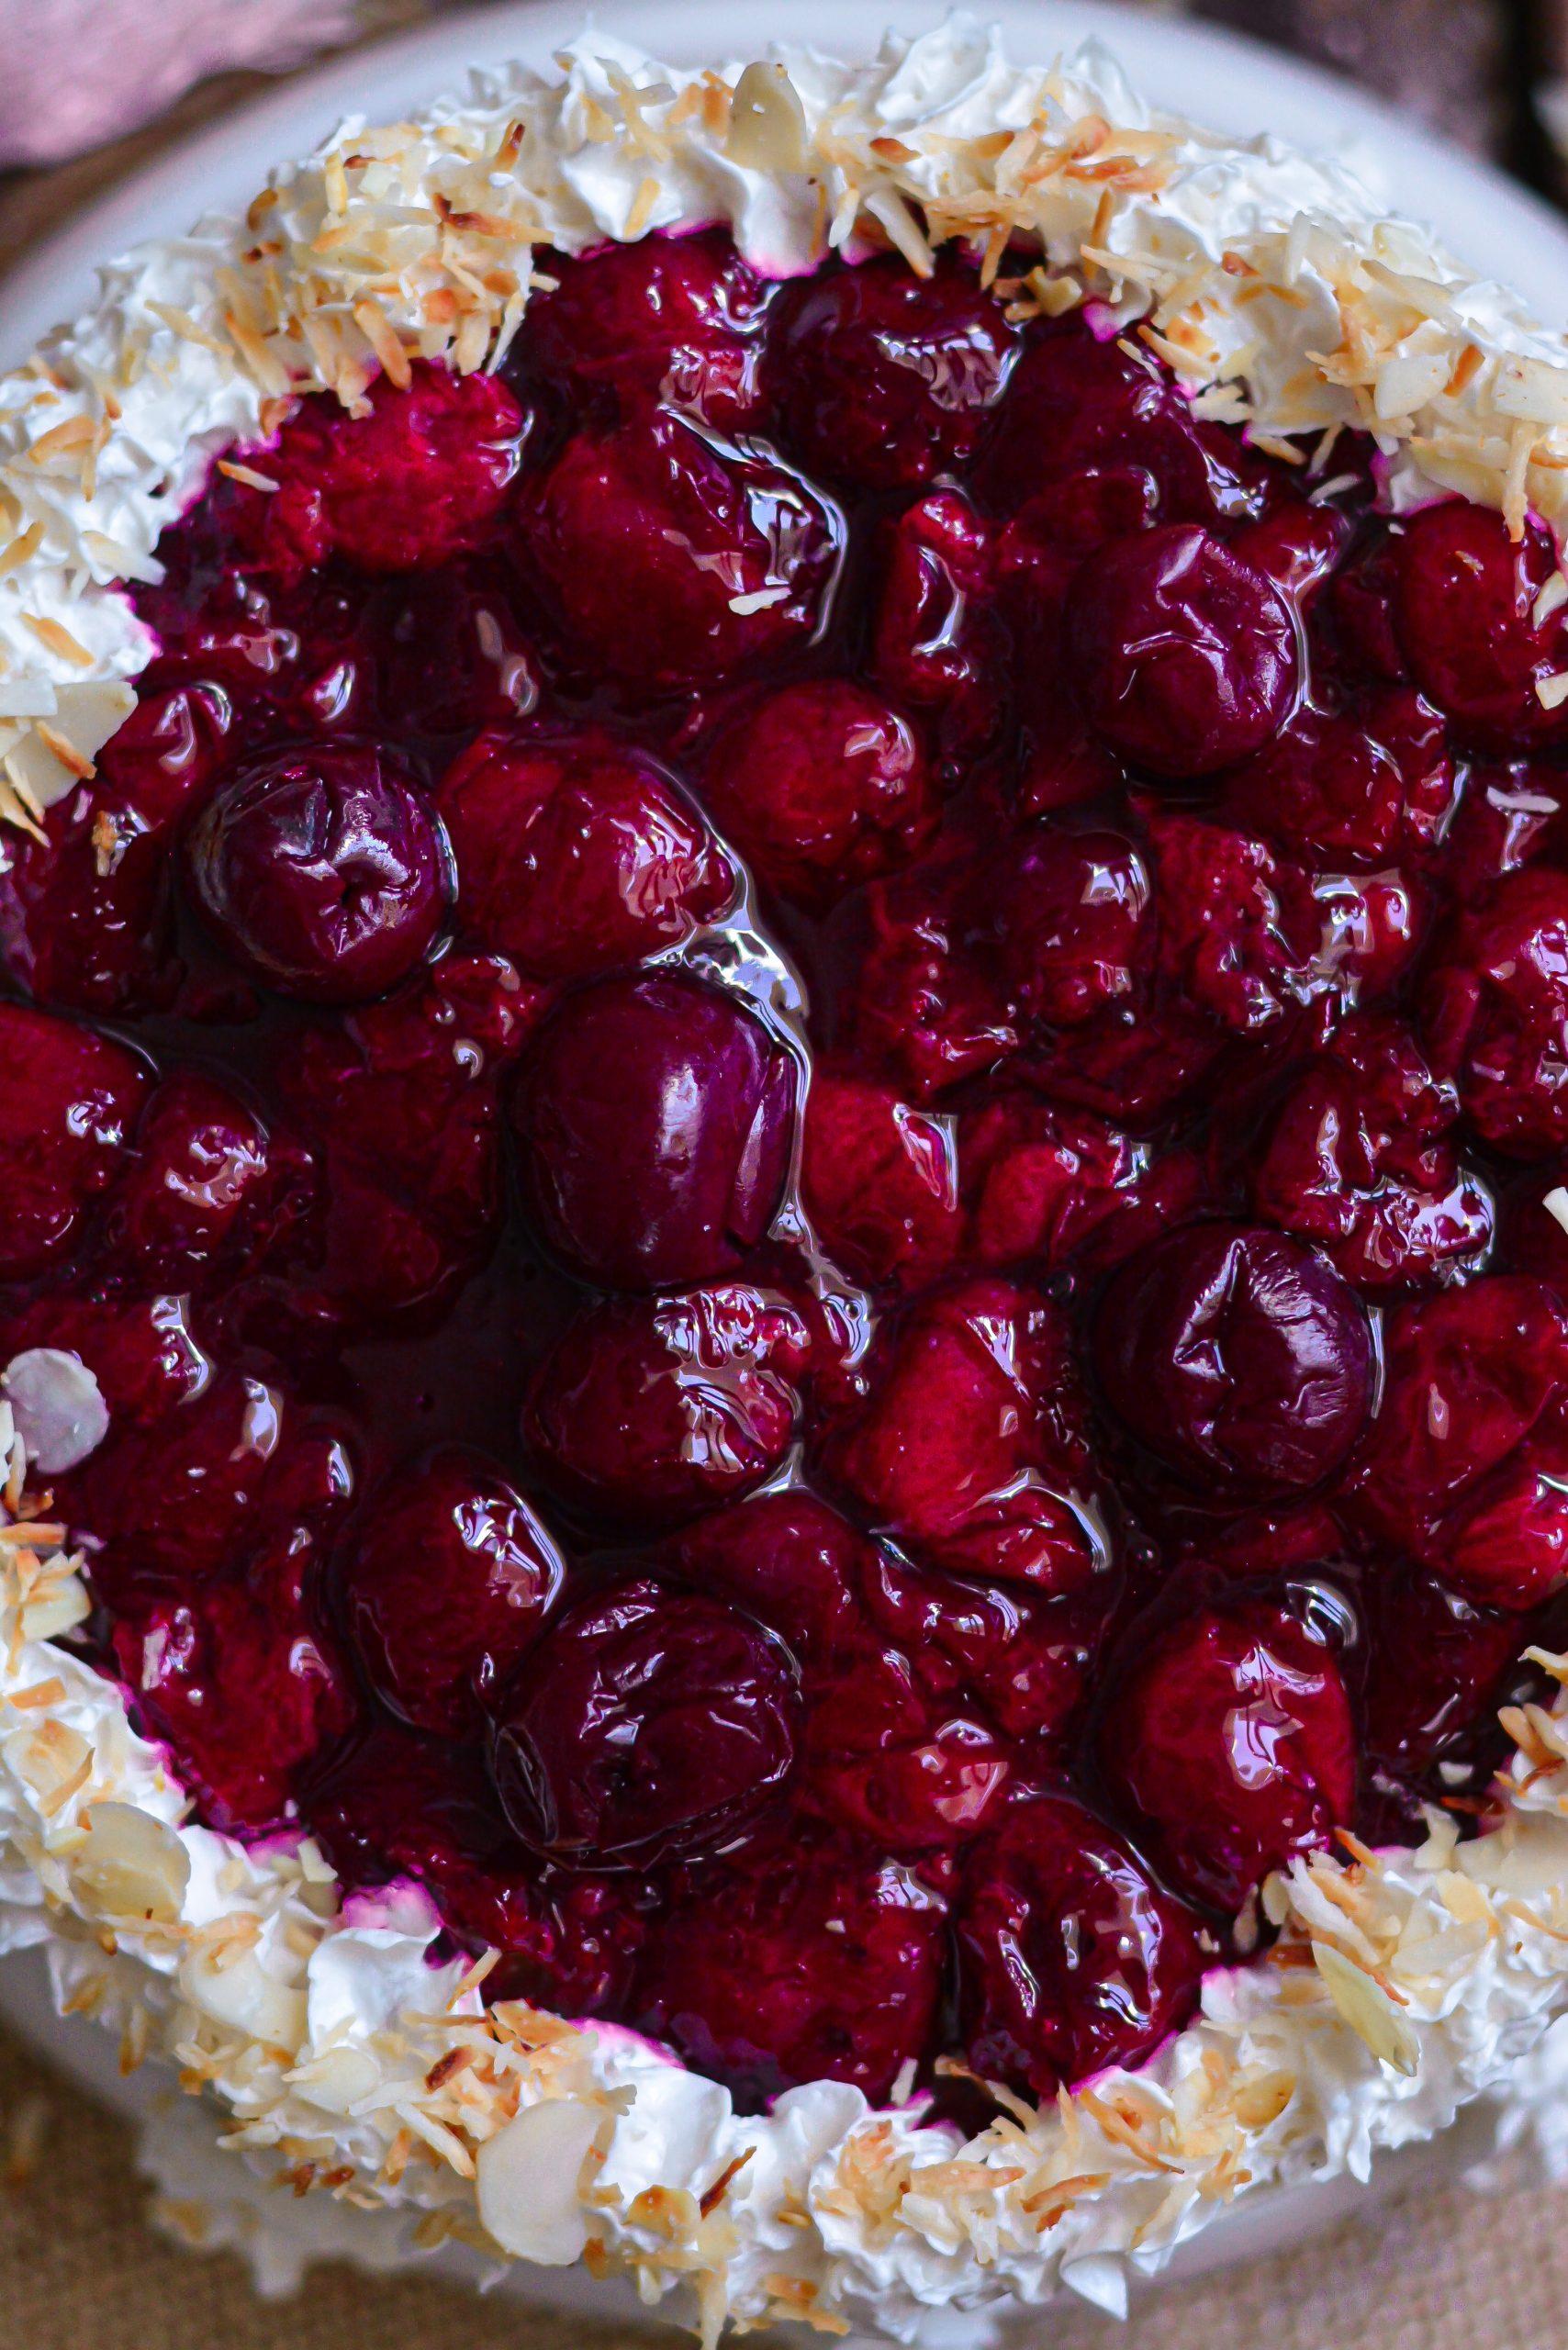 Cheesecake Vegan Vanille et Griottes / Vegan Vanilla Cheesecake and Sour Cherry